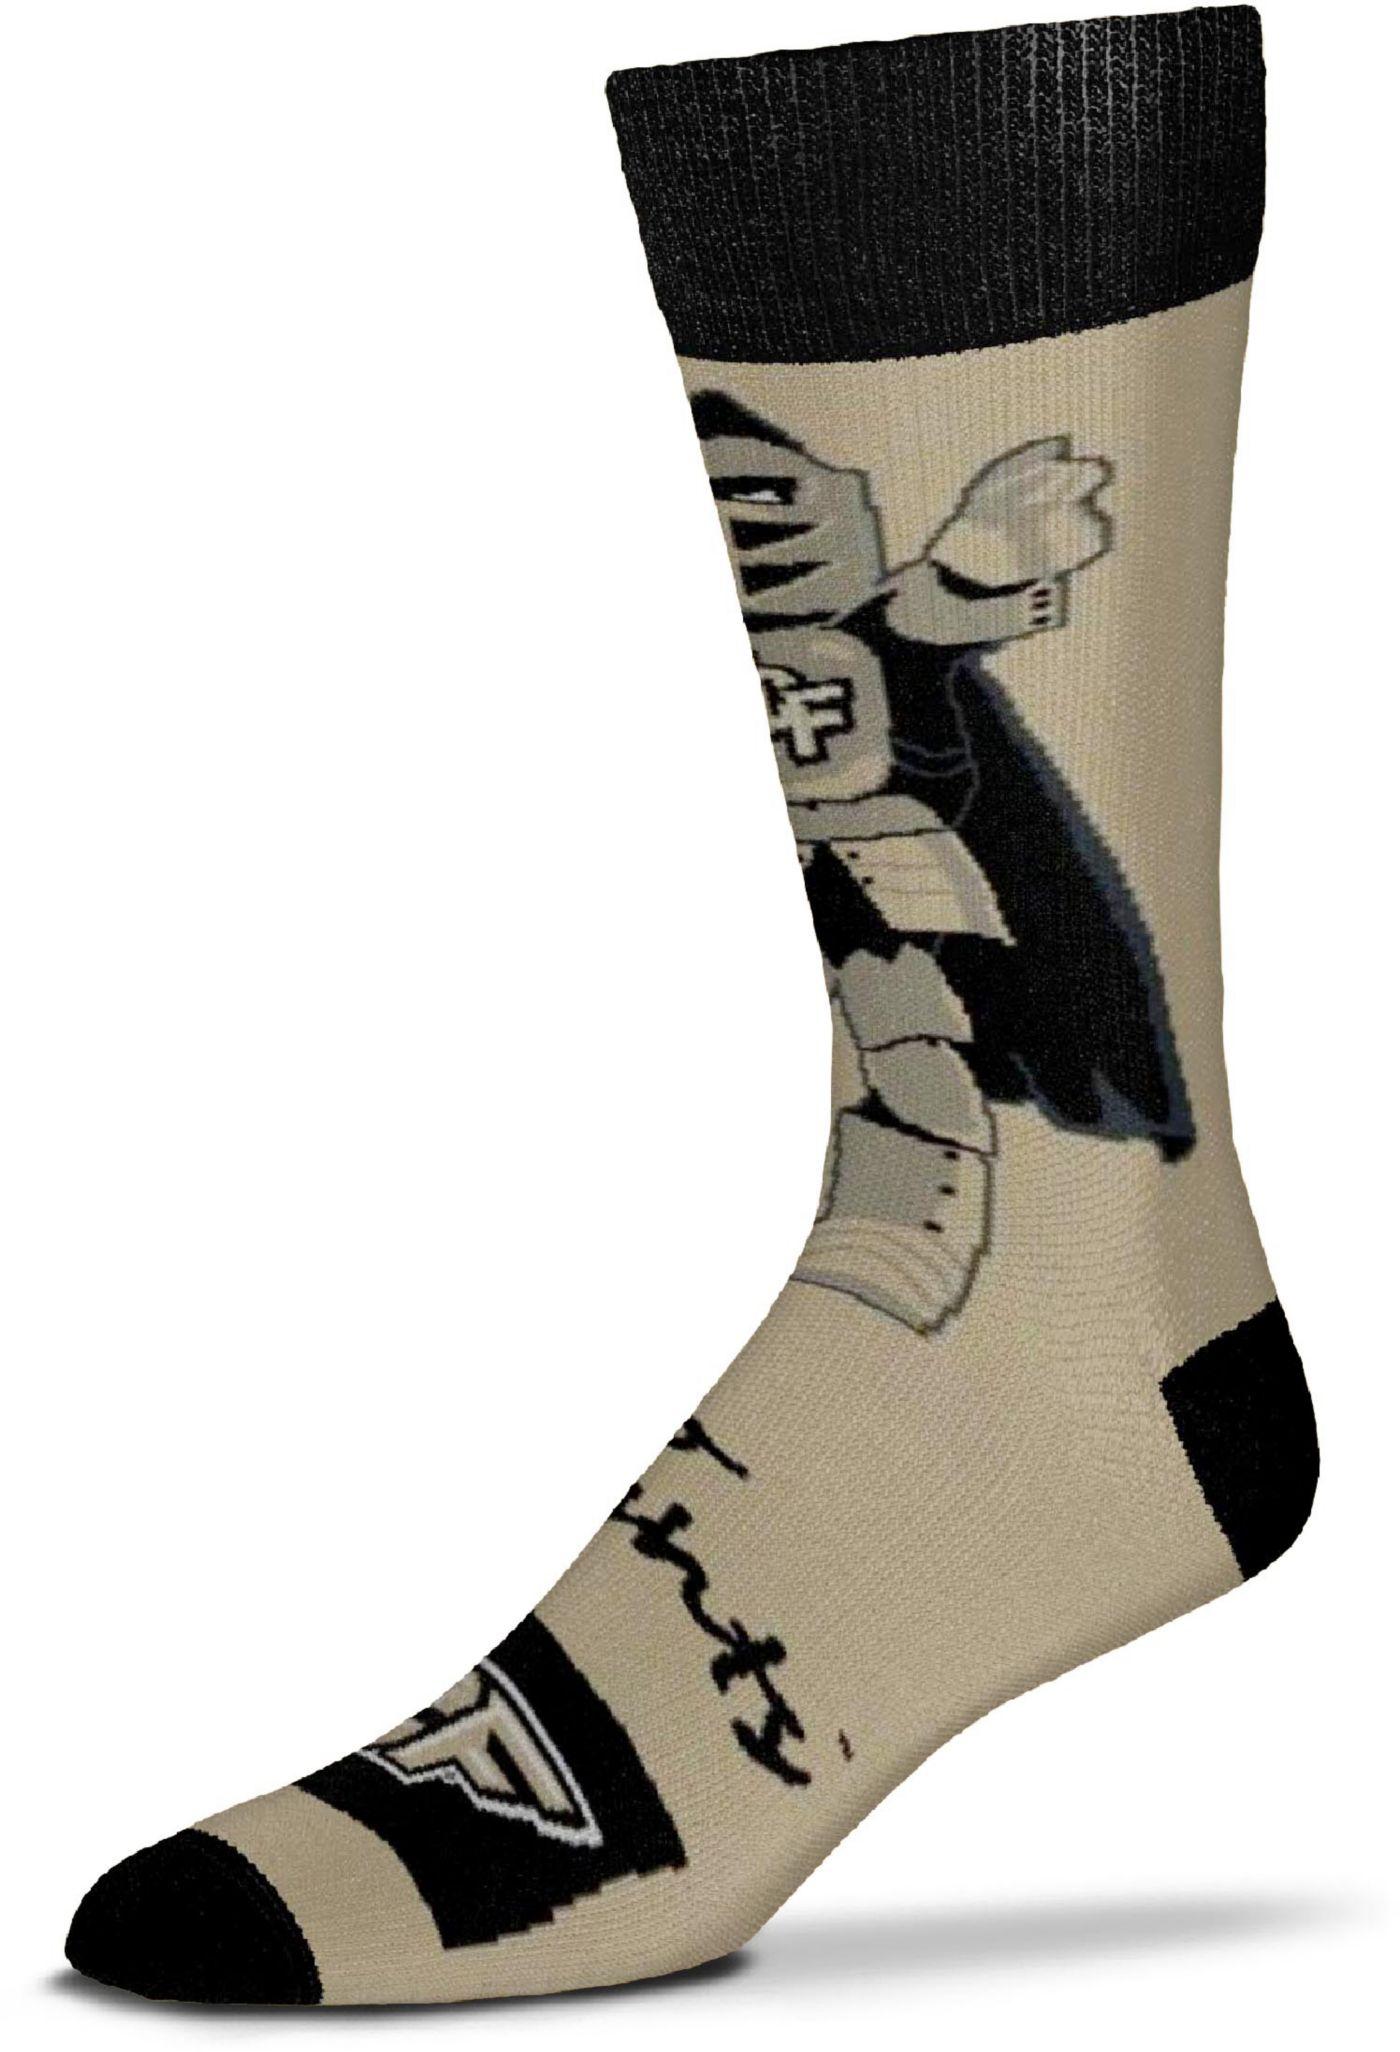 For Bare Feet UCF Knights Thin Crew Socks